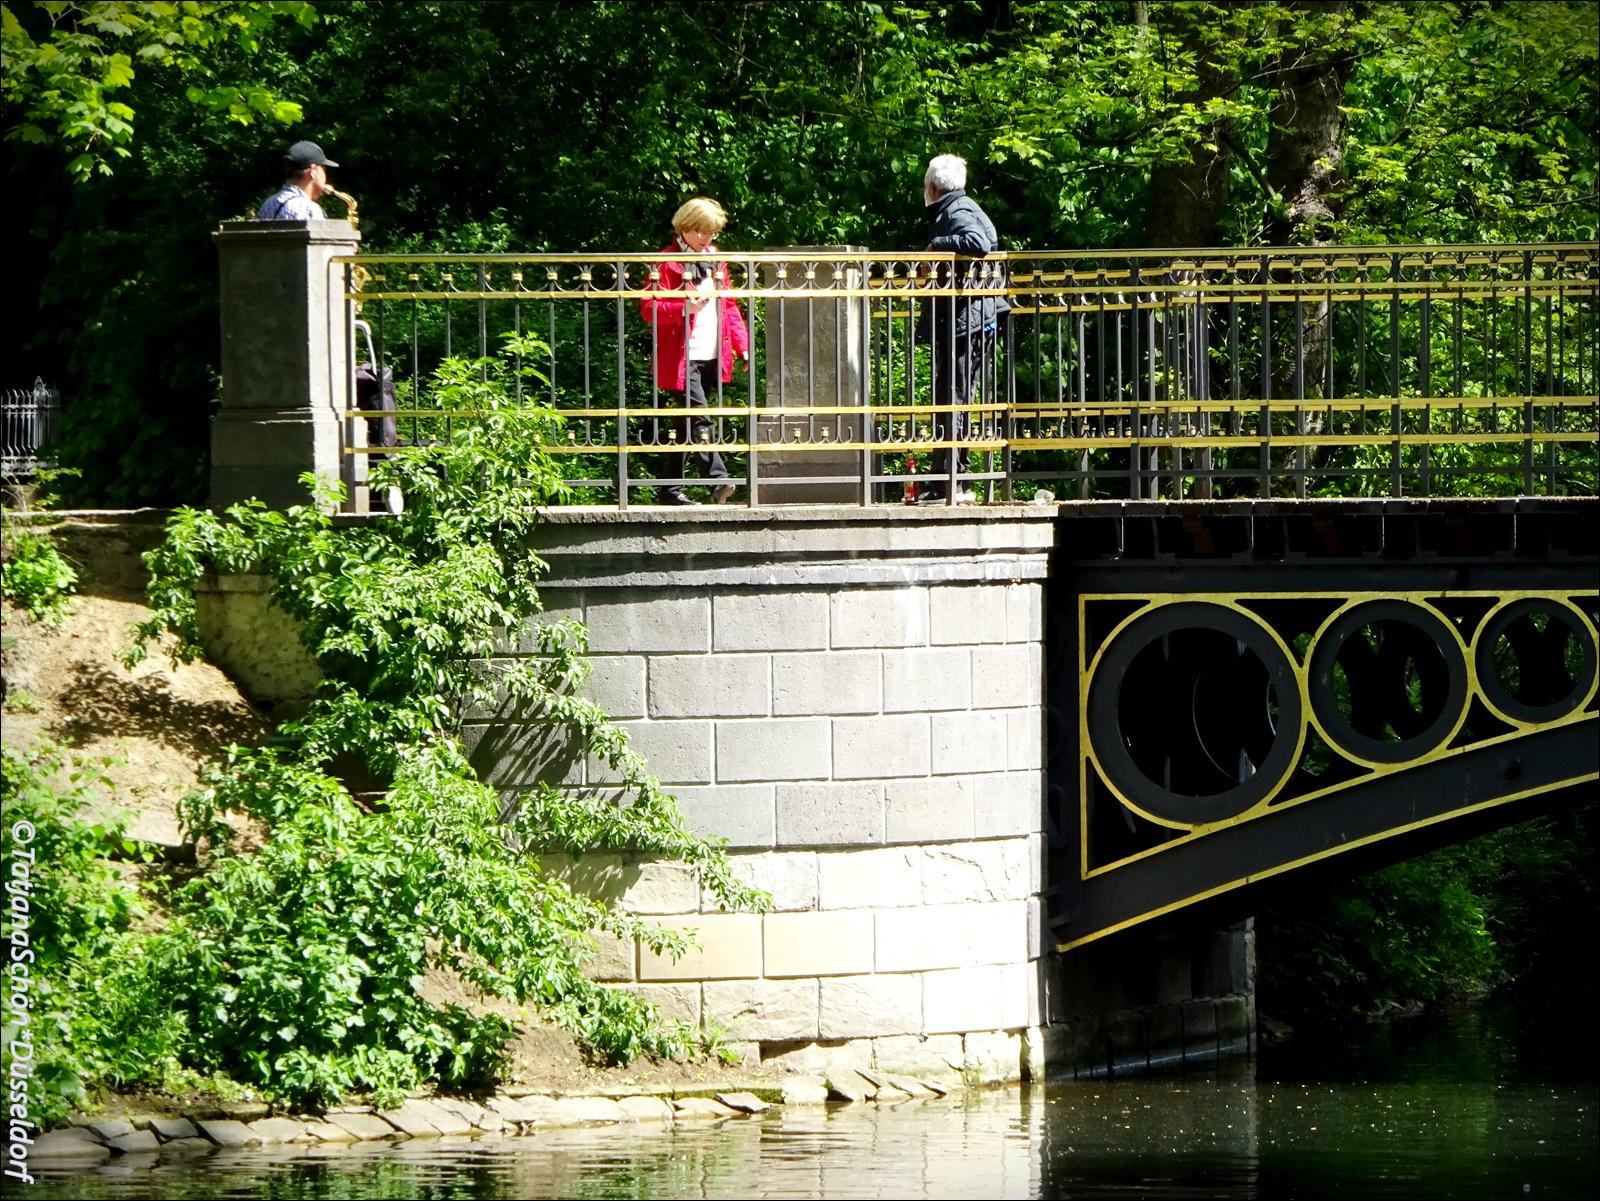 В парке Хофгартен на мосту играет саксофонист...